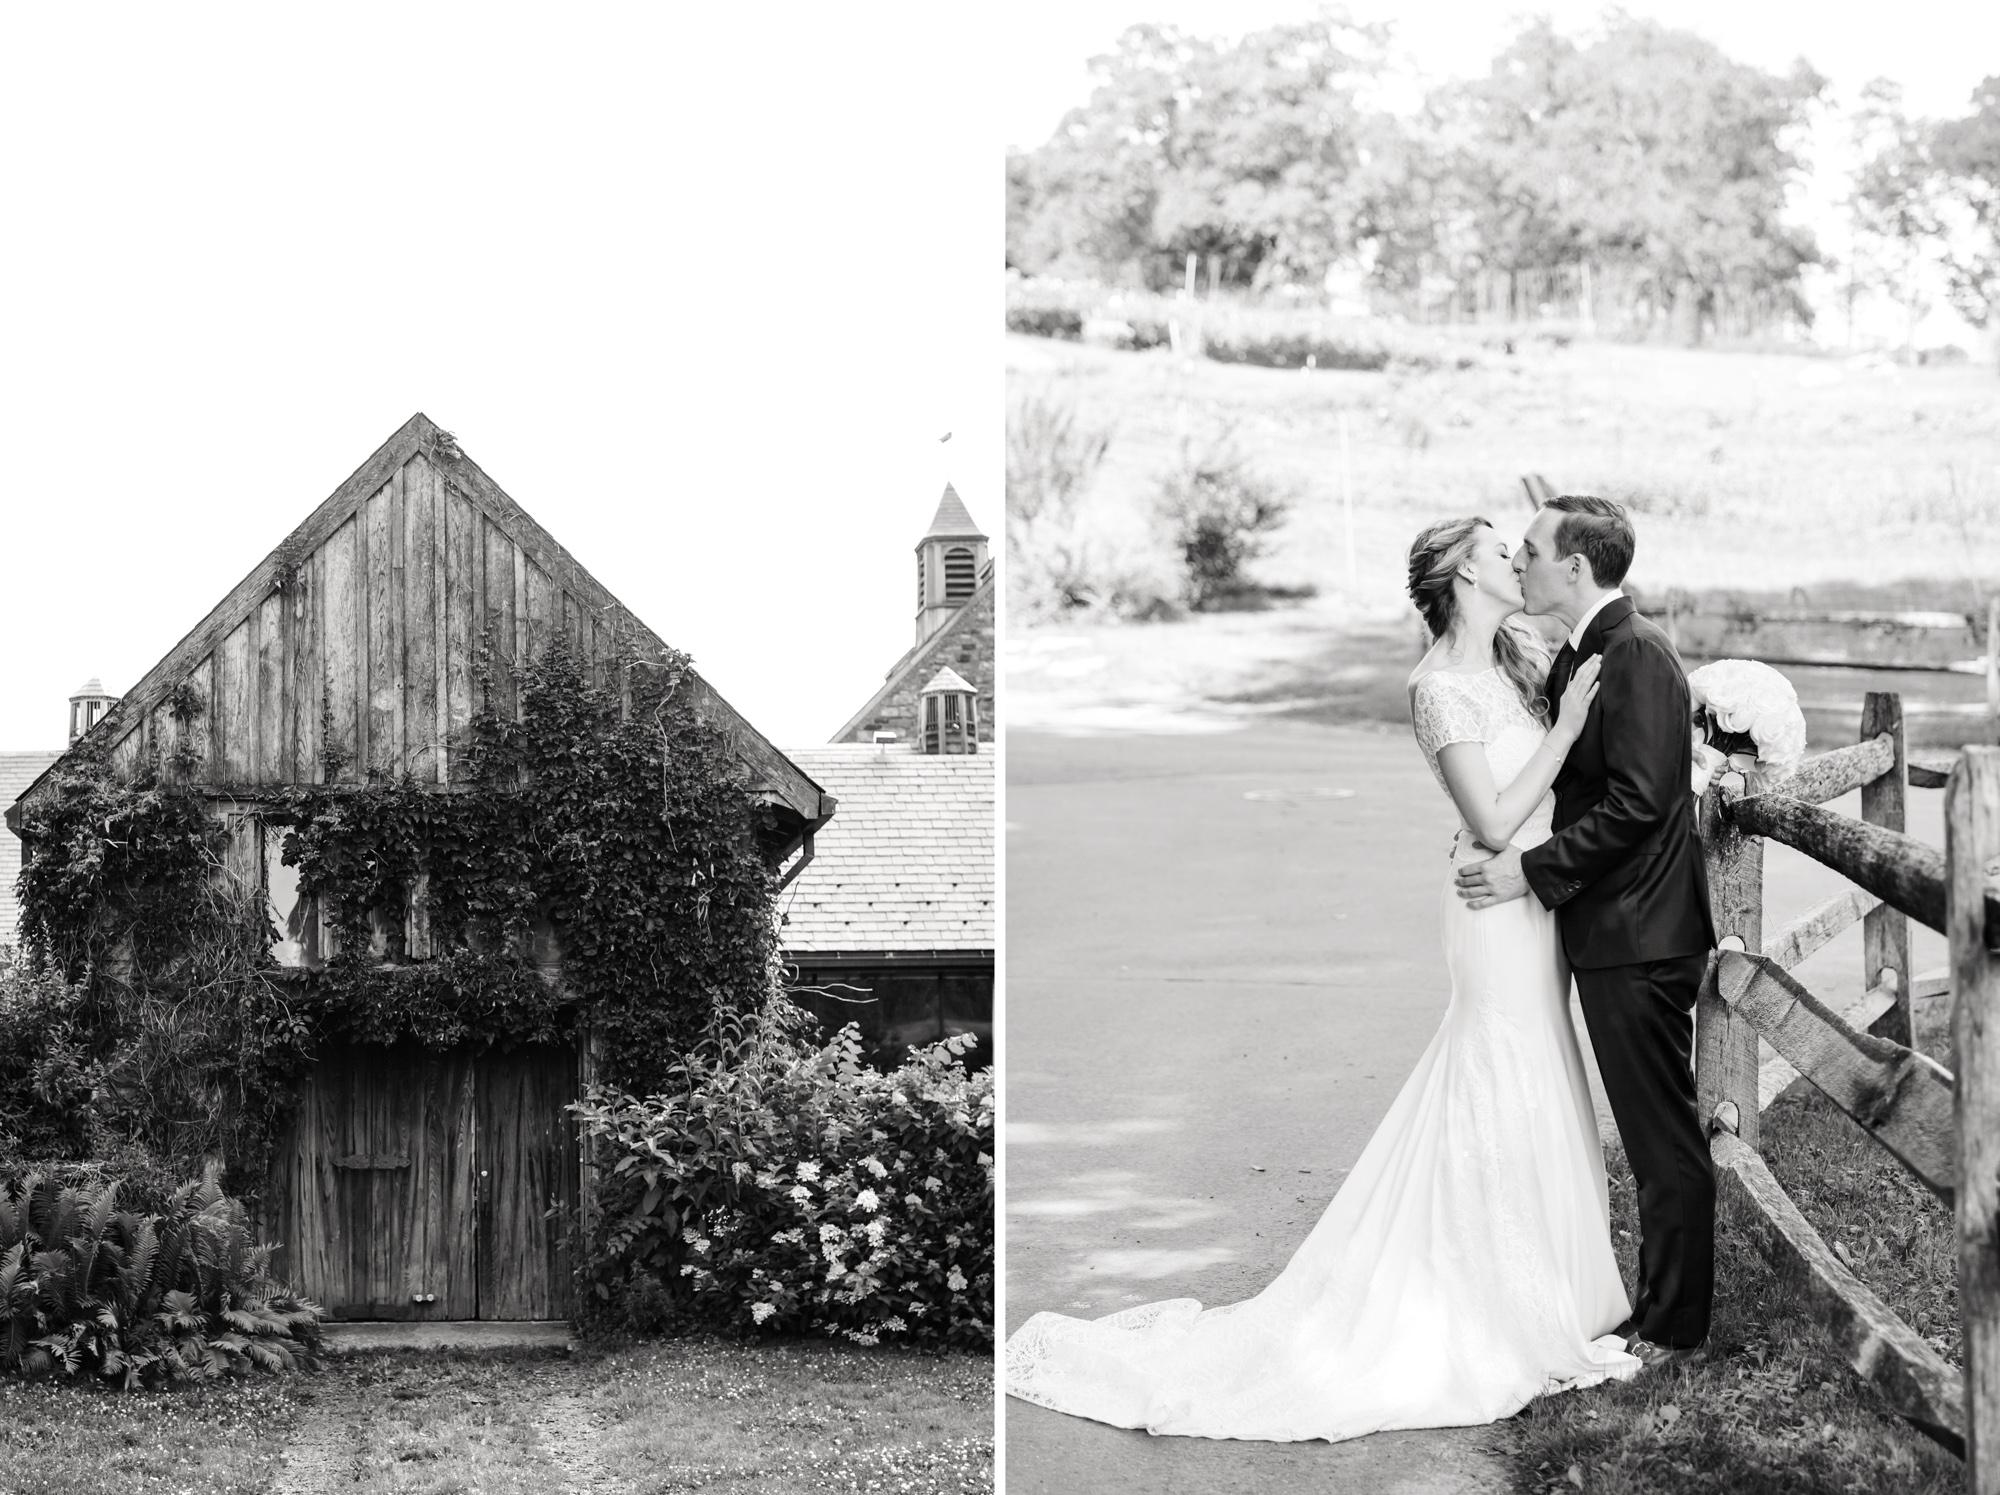 24_Jessica_Ted_Blue_Hill_Stone_Barns_Wedding_Pocantico_NY_Tanya_Salazar_Photography.jpg